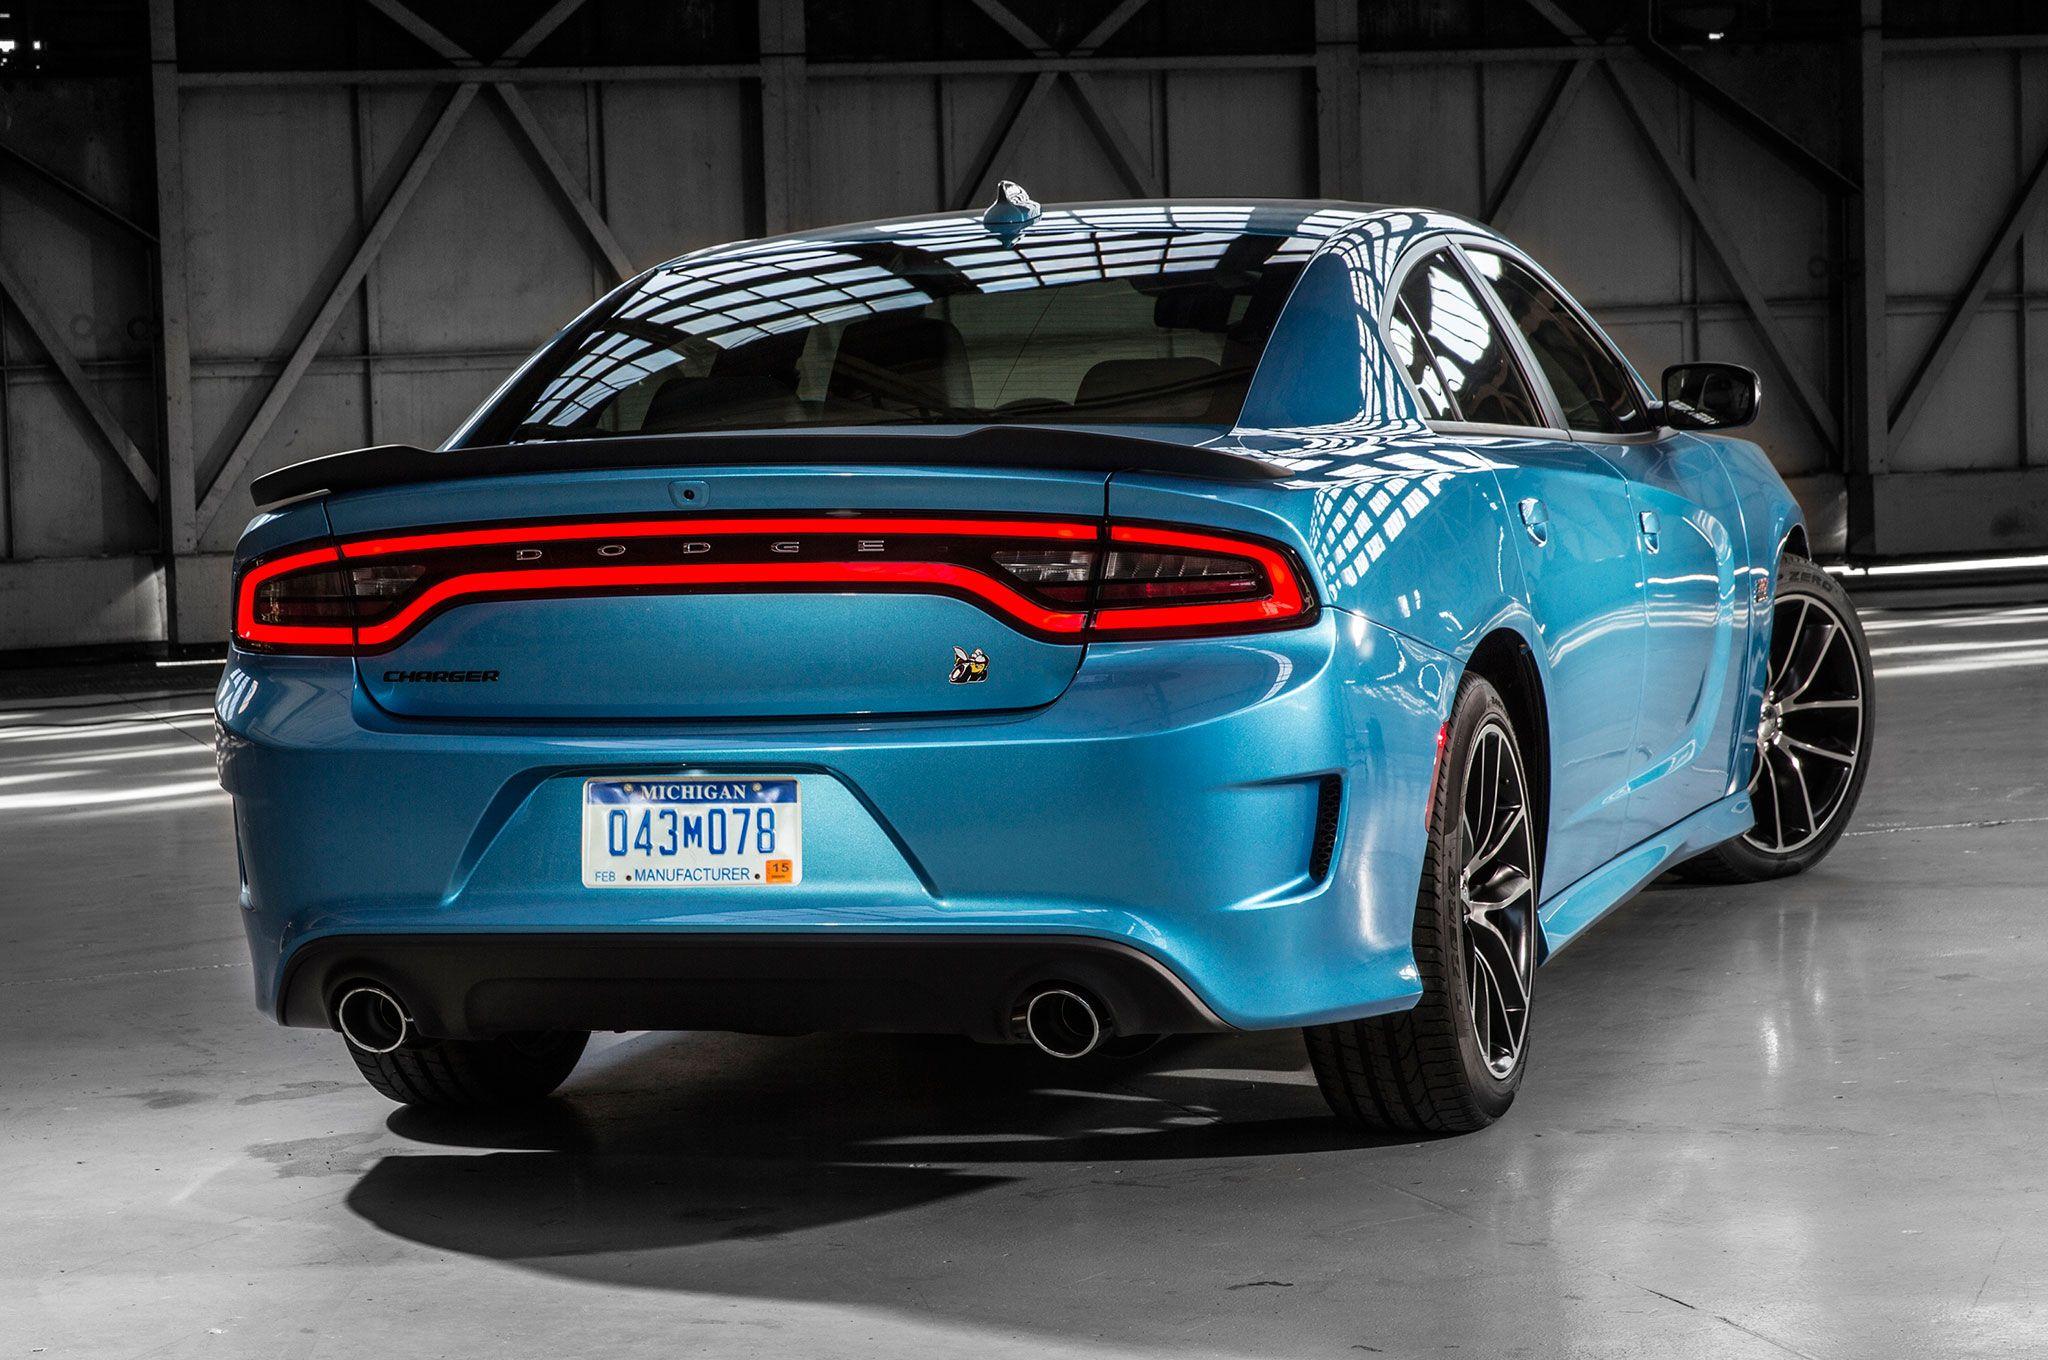 2015 Dodge Charger Scat Pack B5 Blue Cars Pinterest